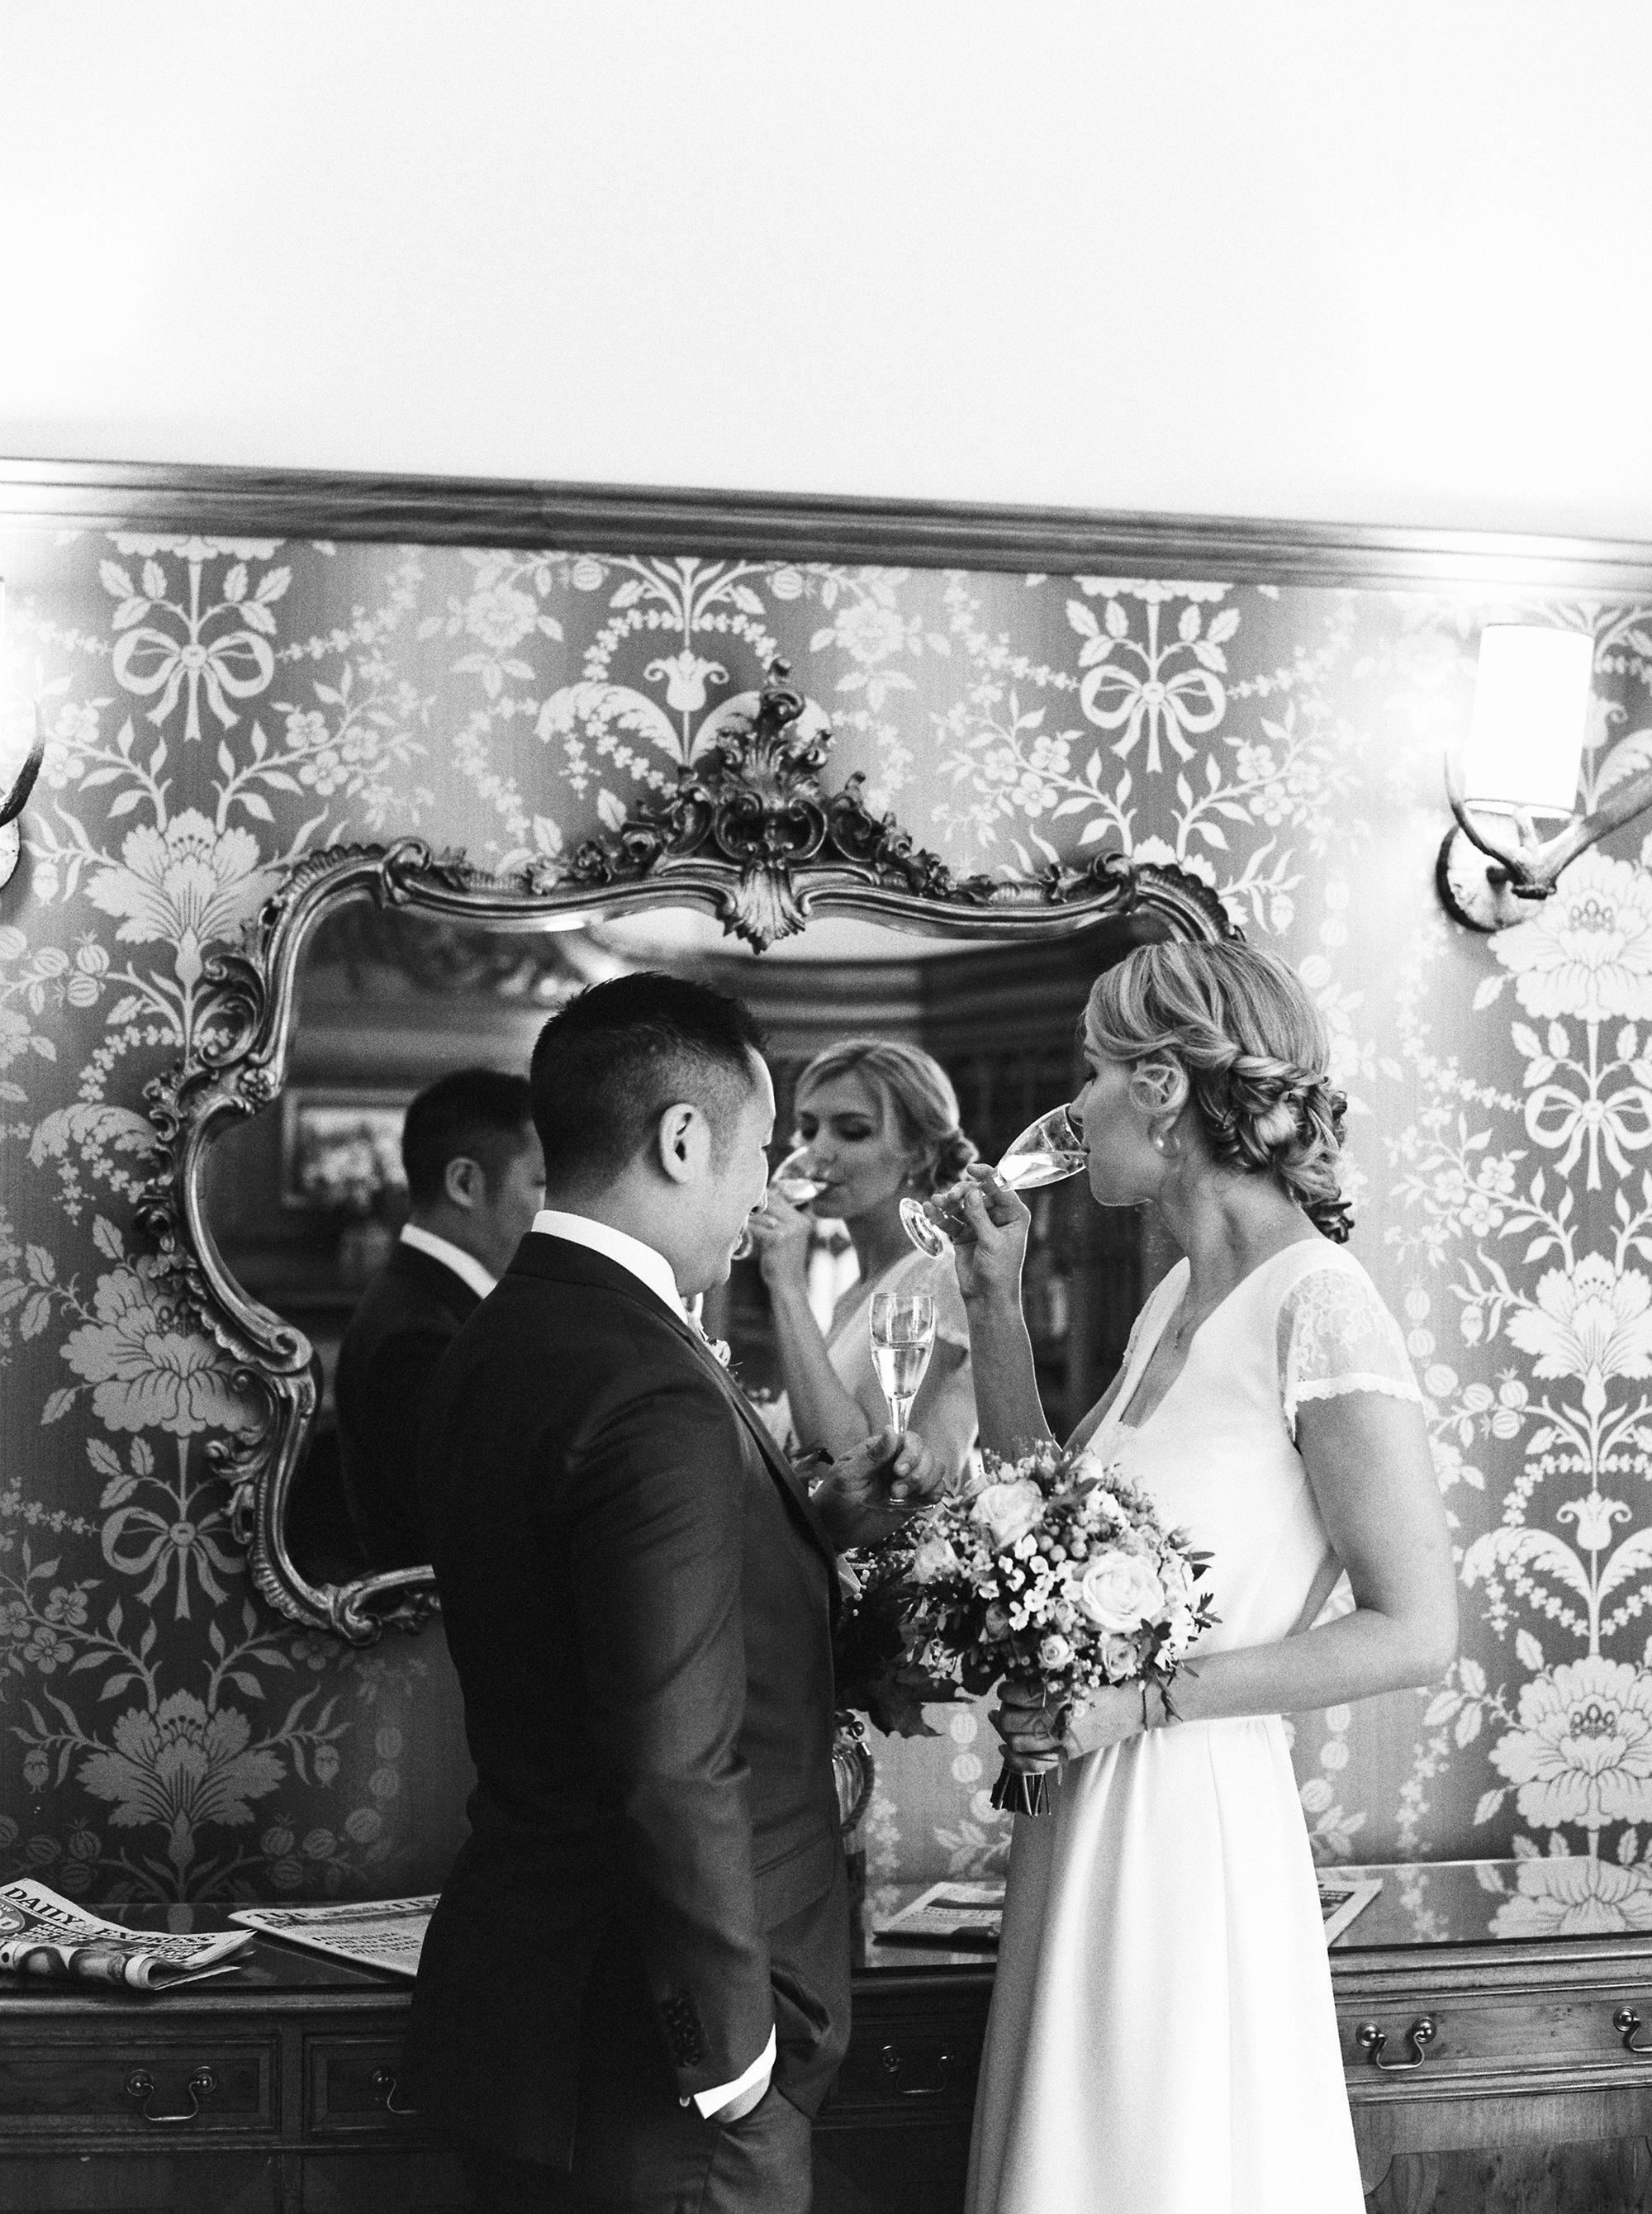 wedding_photographer_cumbria002.jpg